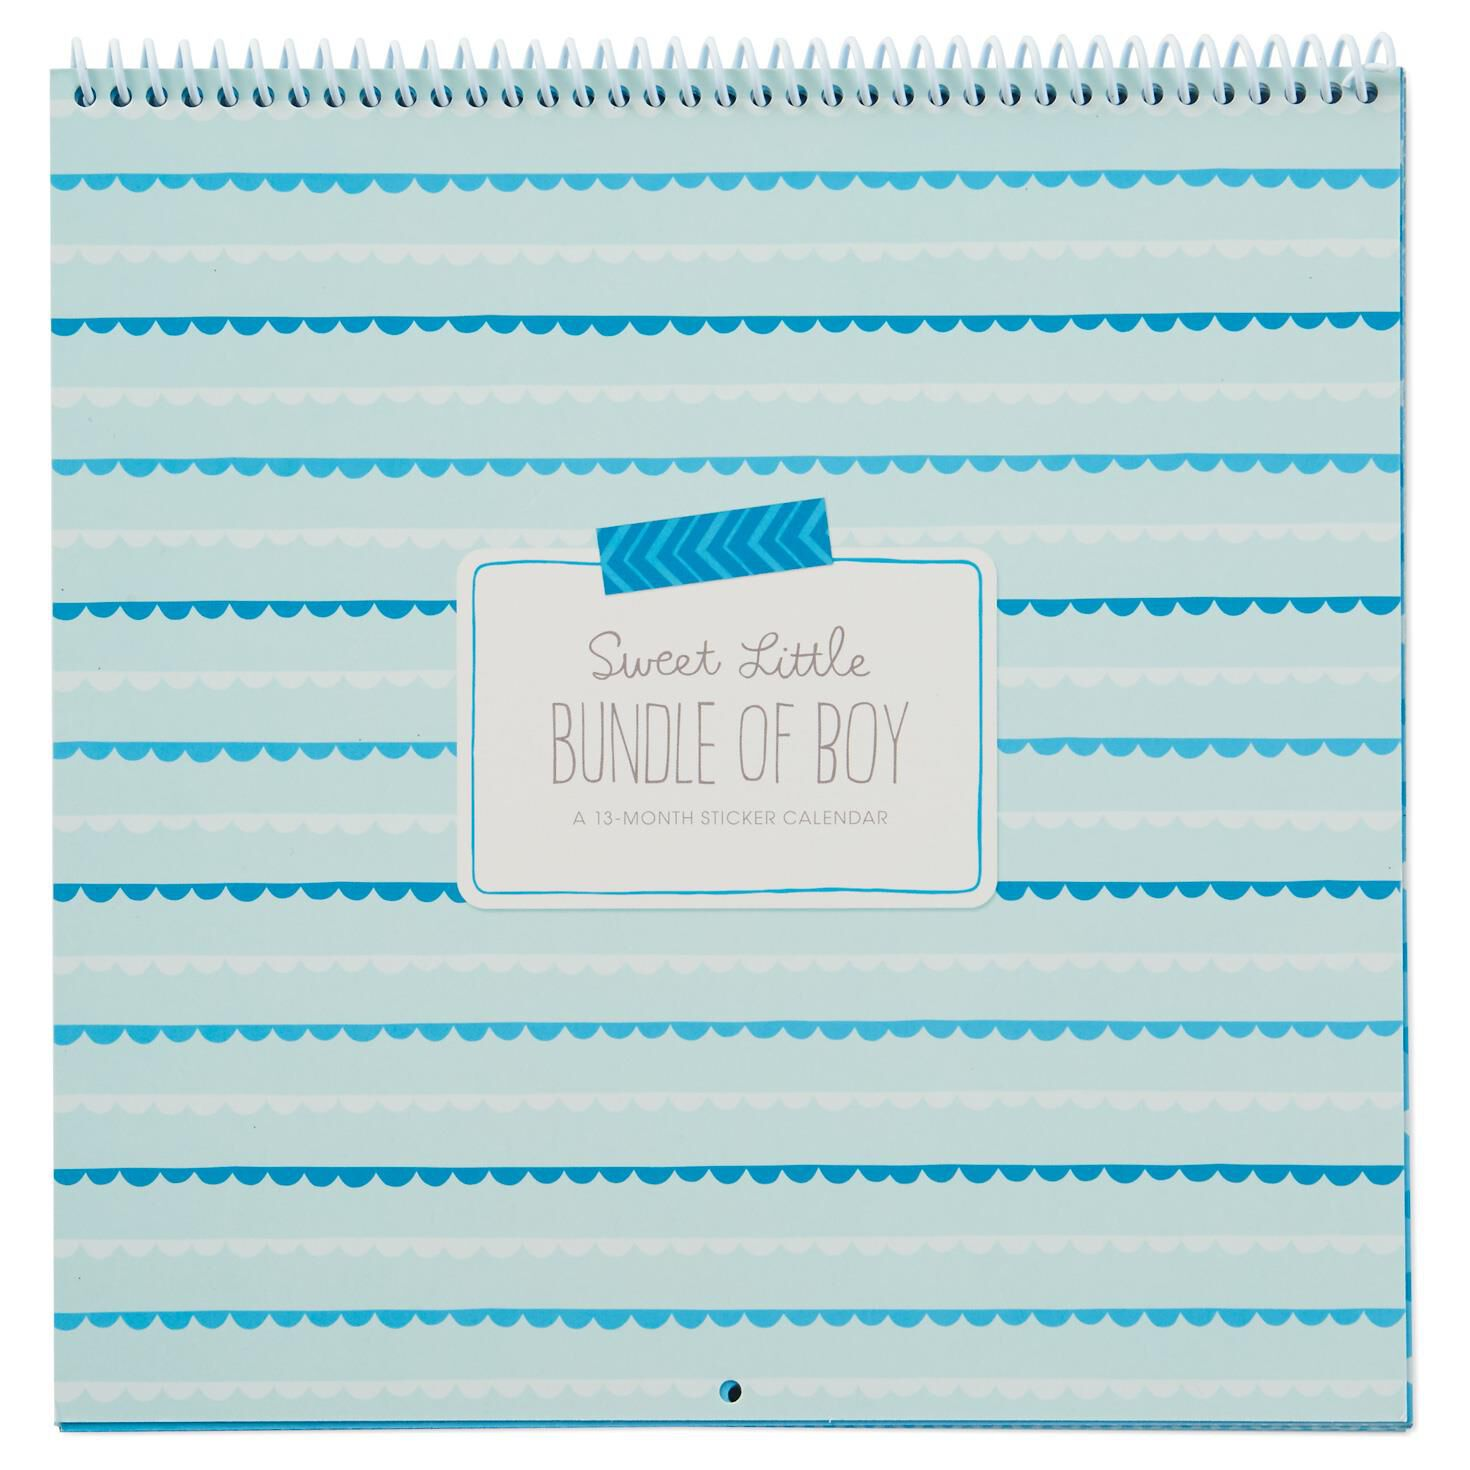 Kids Calendar With Activity Stickers : Baby boy sticker and photo month calendar calendars hallmark